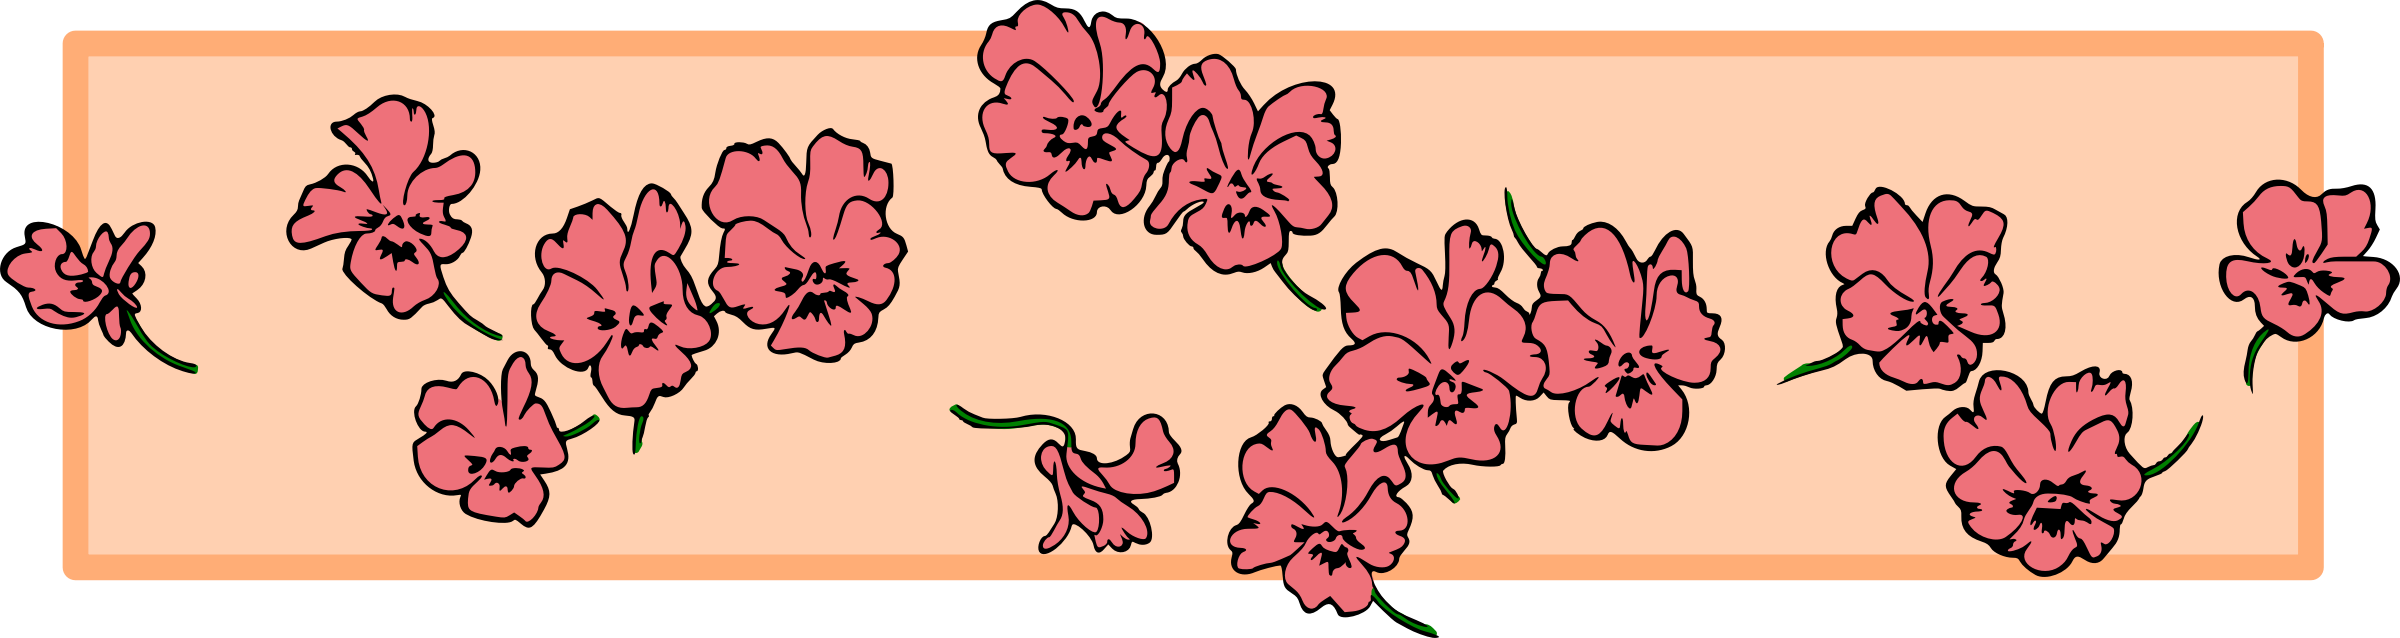 Divider clipart flower. Floral colour big image